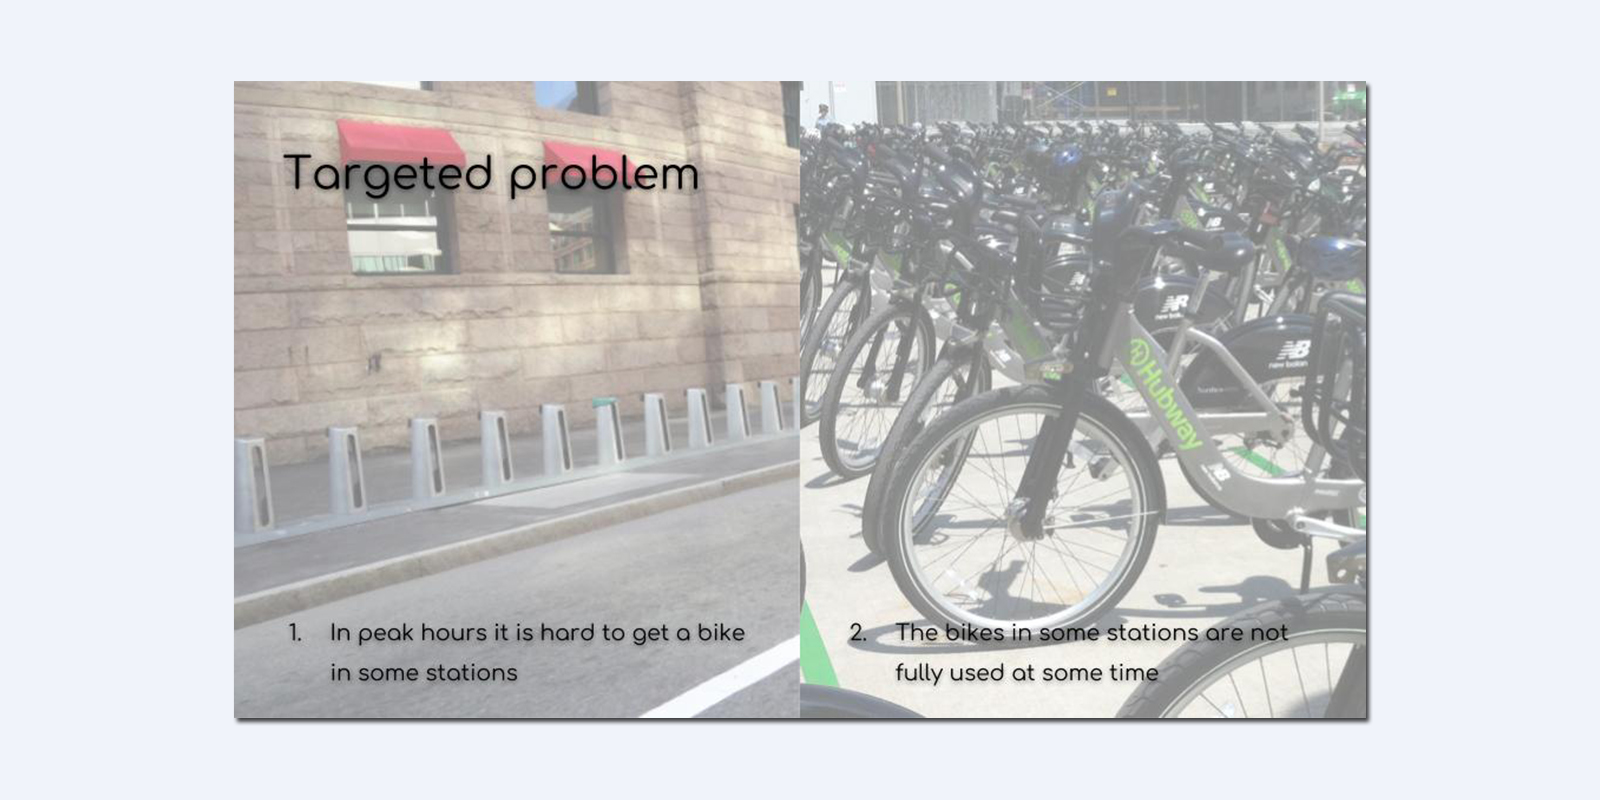 2. Targeted problem